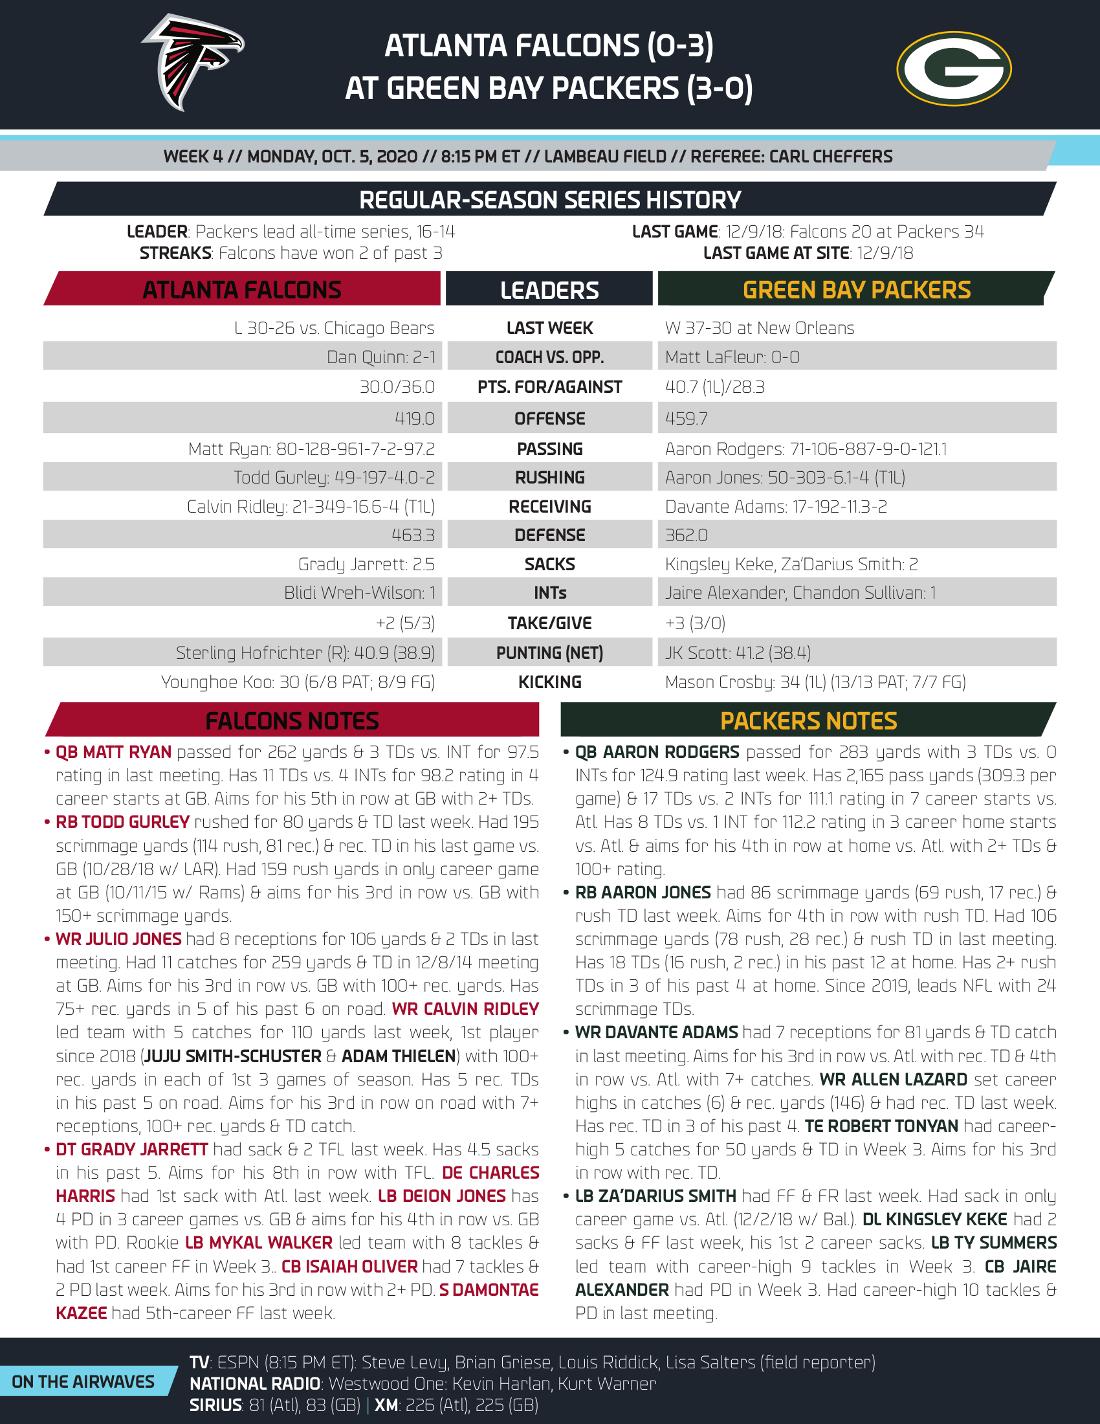 How To Watch And Prediction Atlanta Falcons At Green Bay Packers